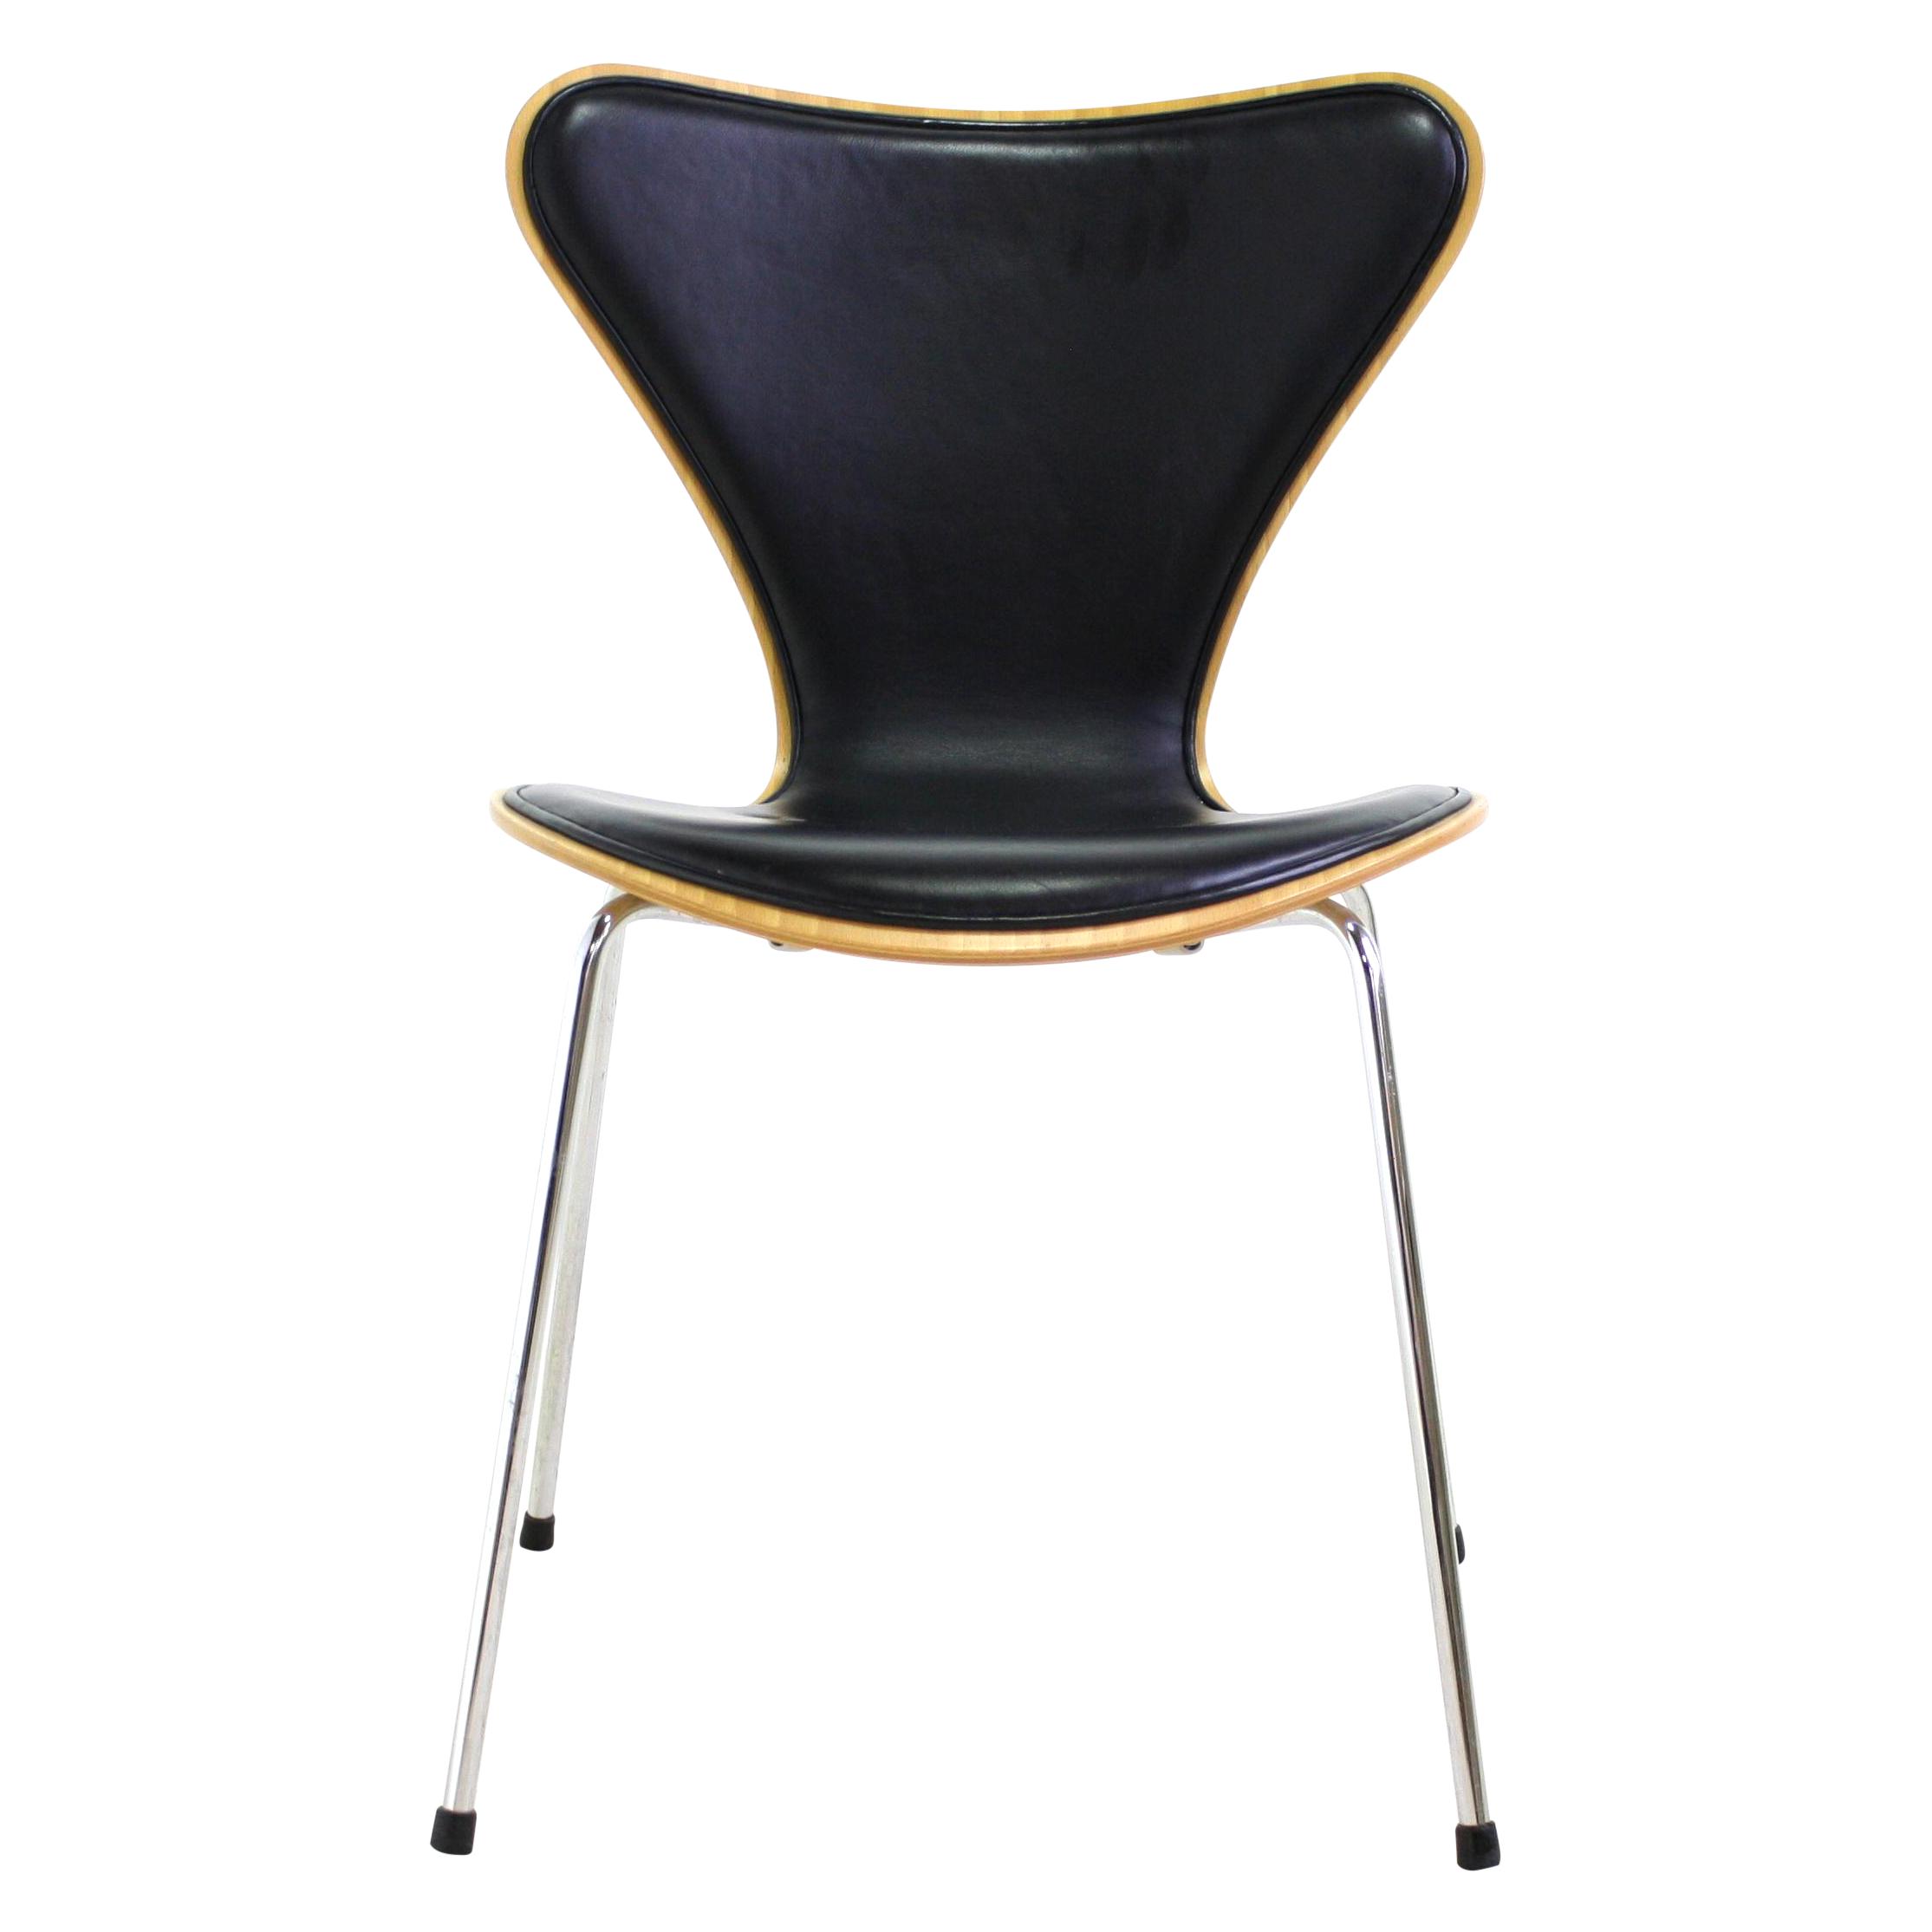 arne jacobsen series 7 chair black 4 avail chairish. Black Bedroom Furniture Sets. Home Design Ideas